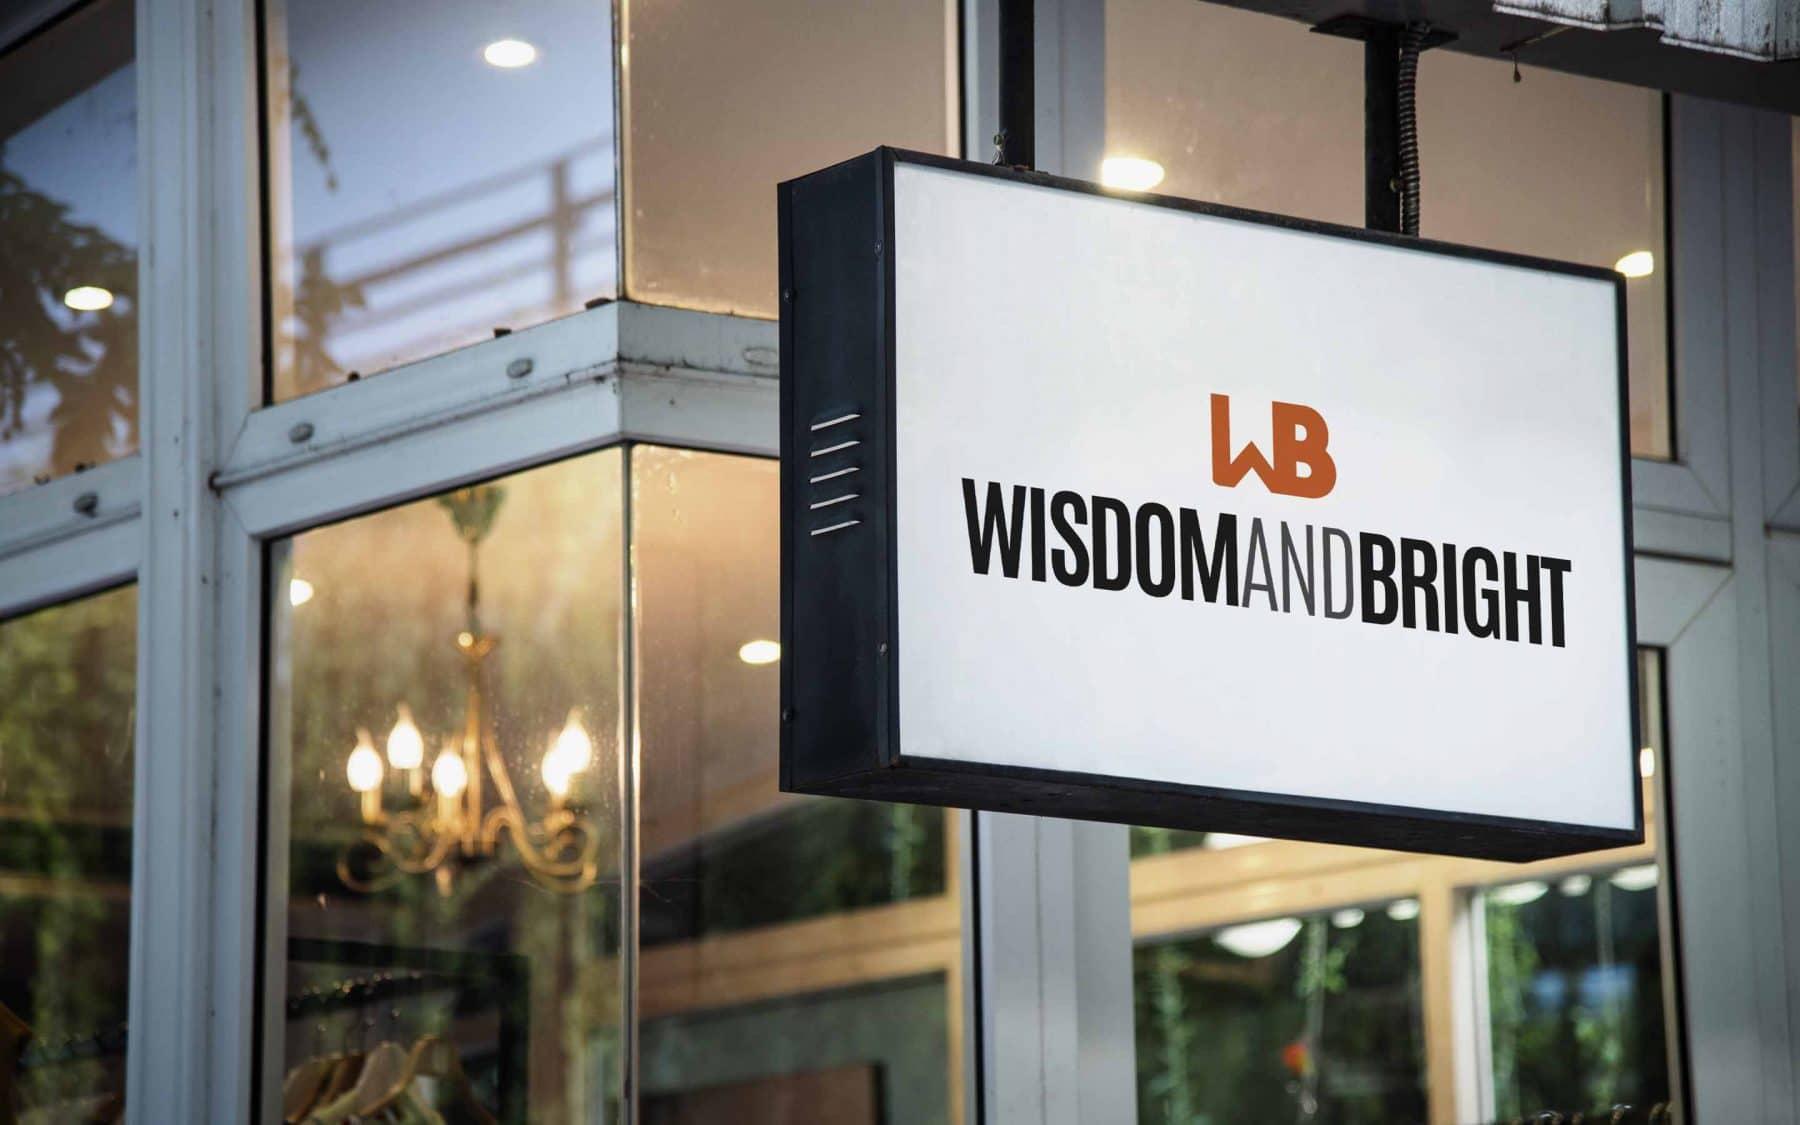 WisdomandBright 3